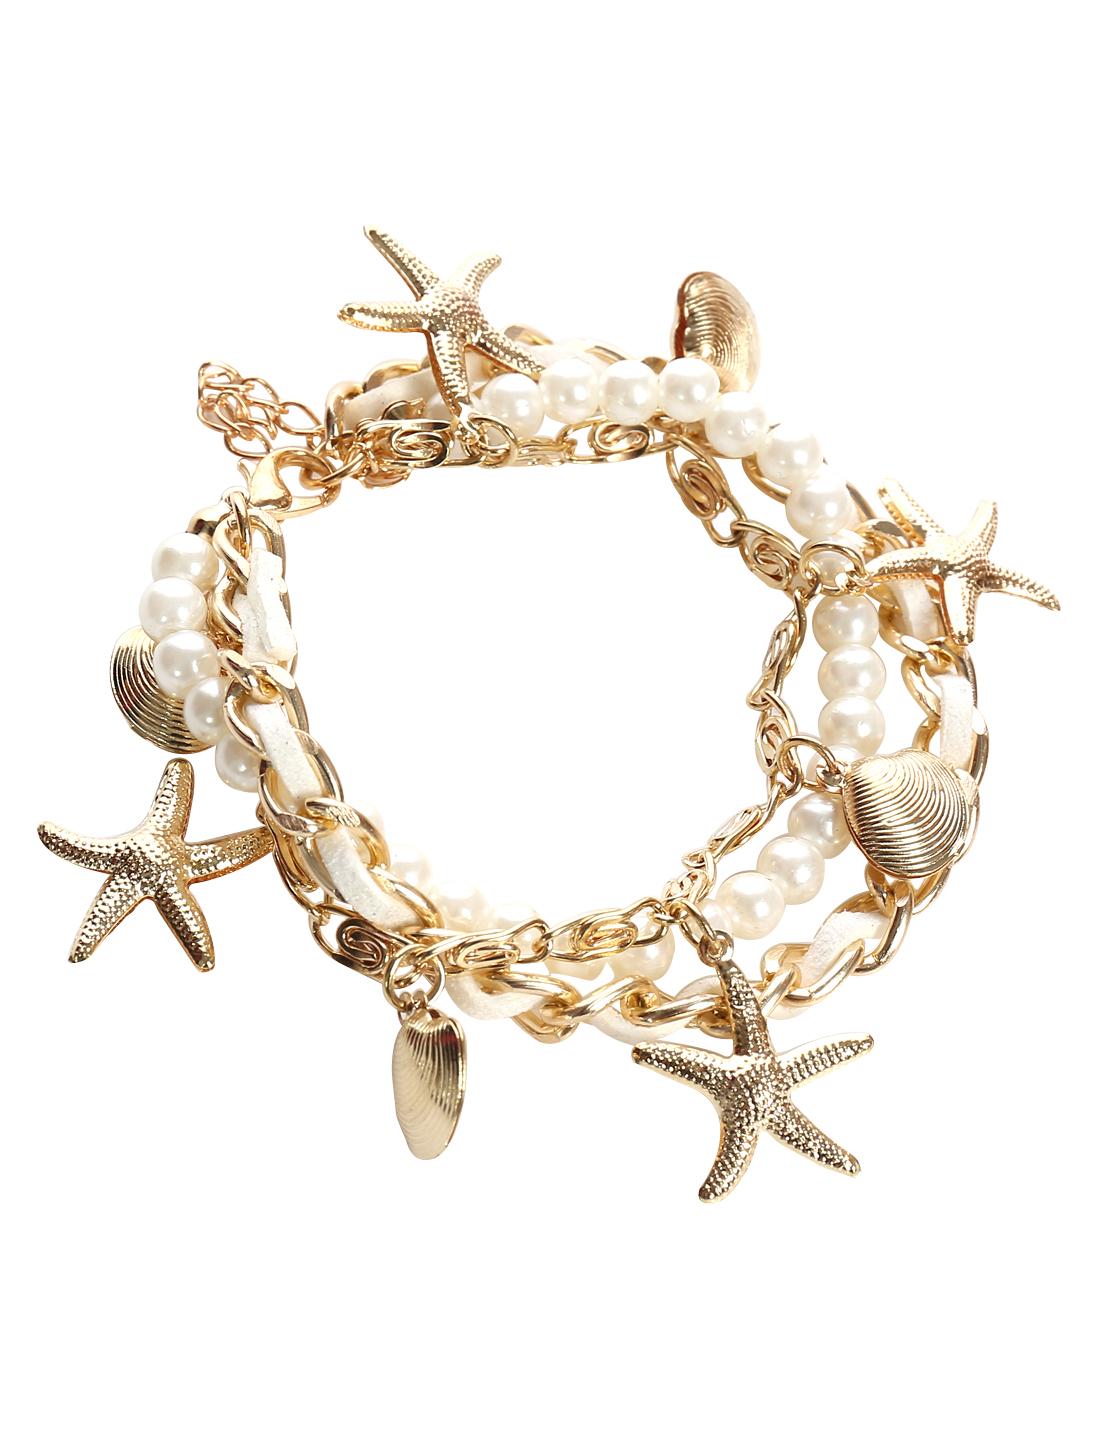 Starfish Shell White Leather Imitation Pearl Charm Wrap Wristband Bracelet Bangle Chain Cuff